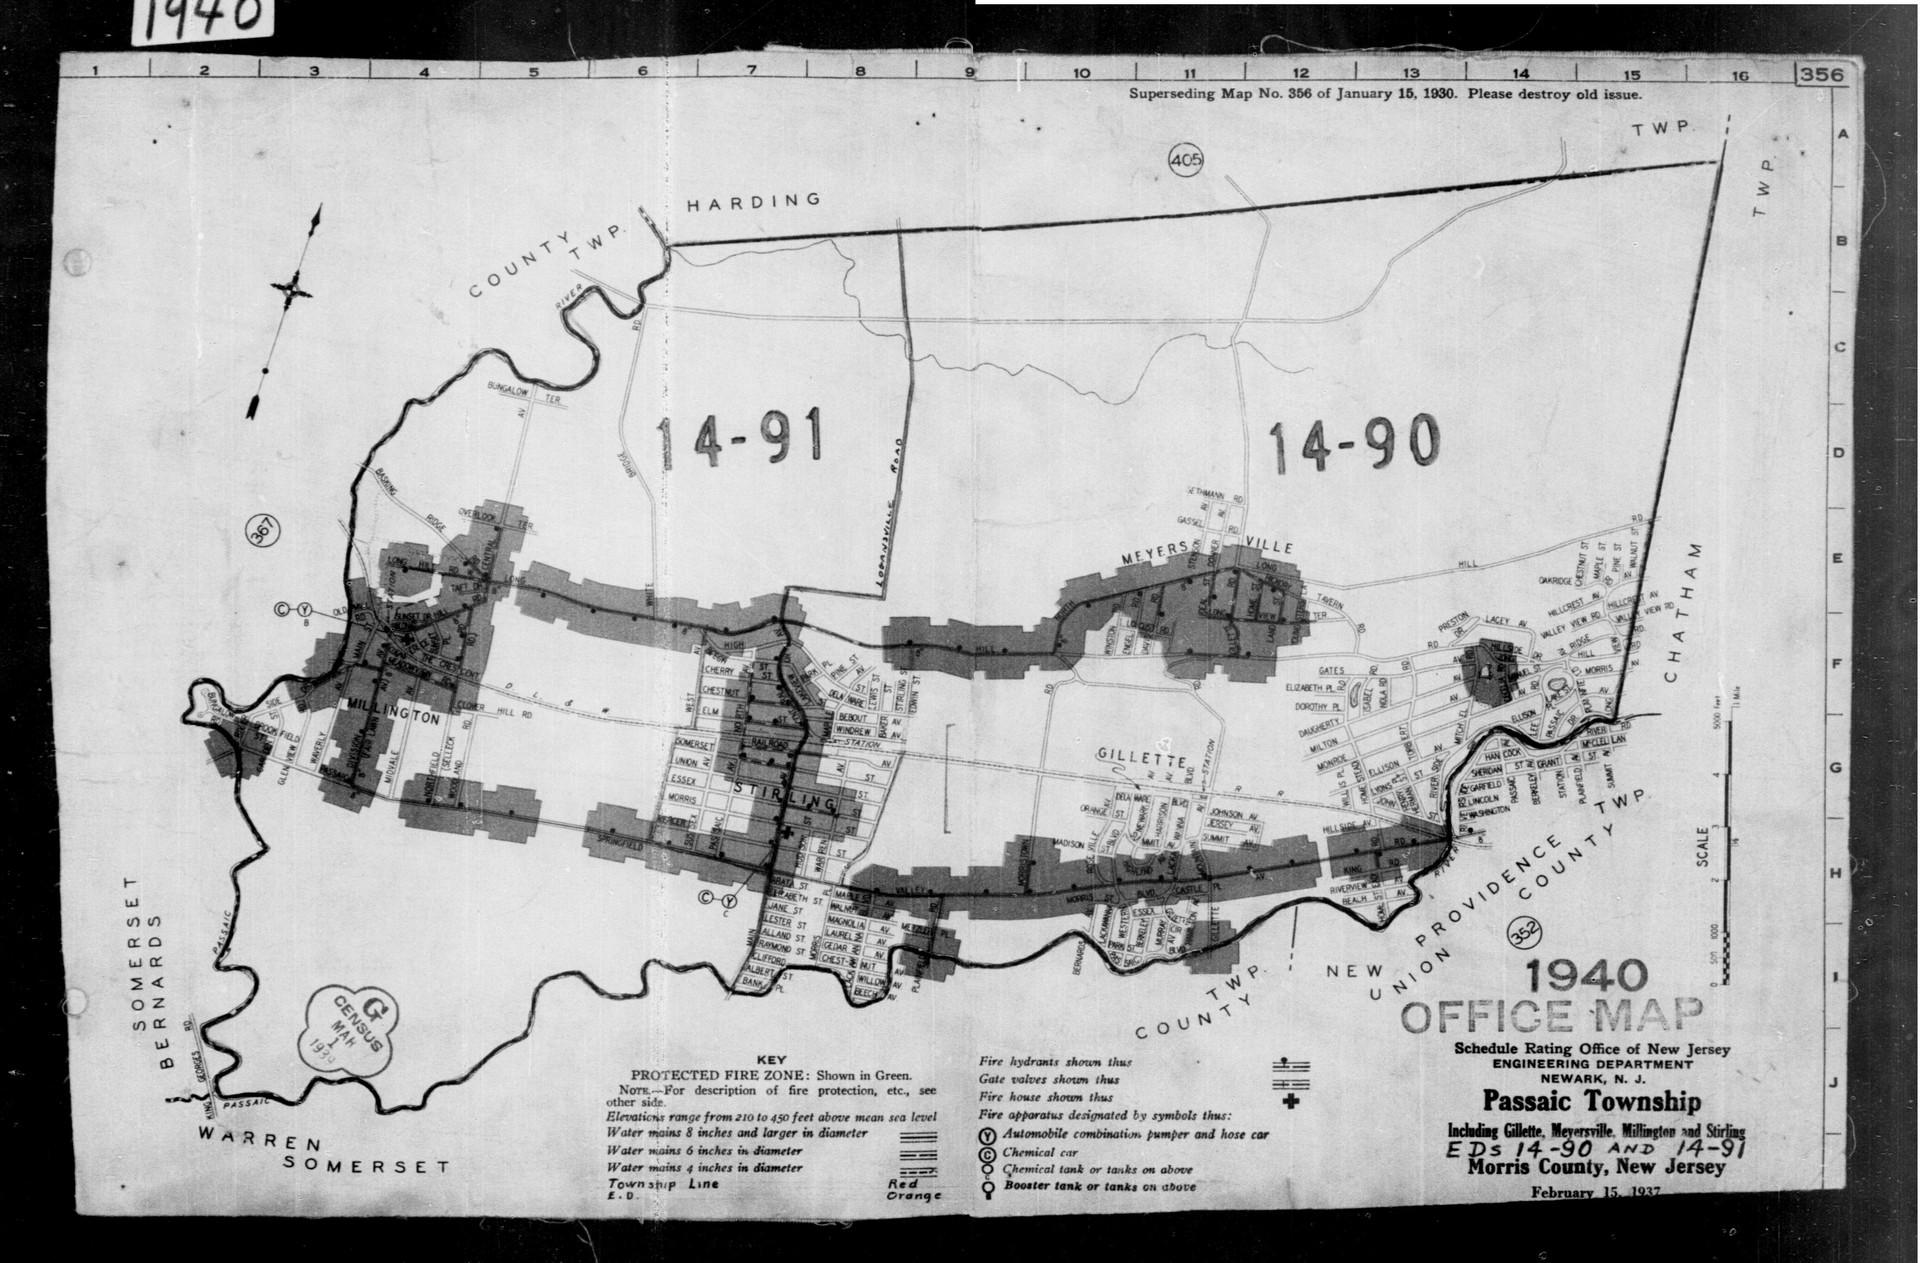 1937 Planning Map